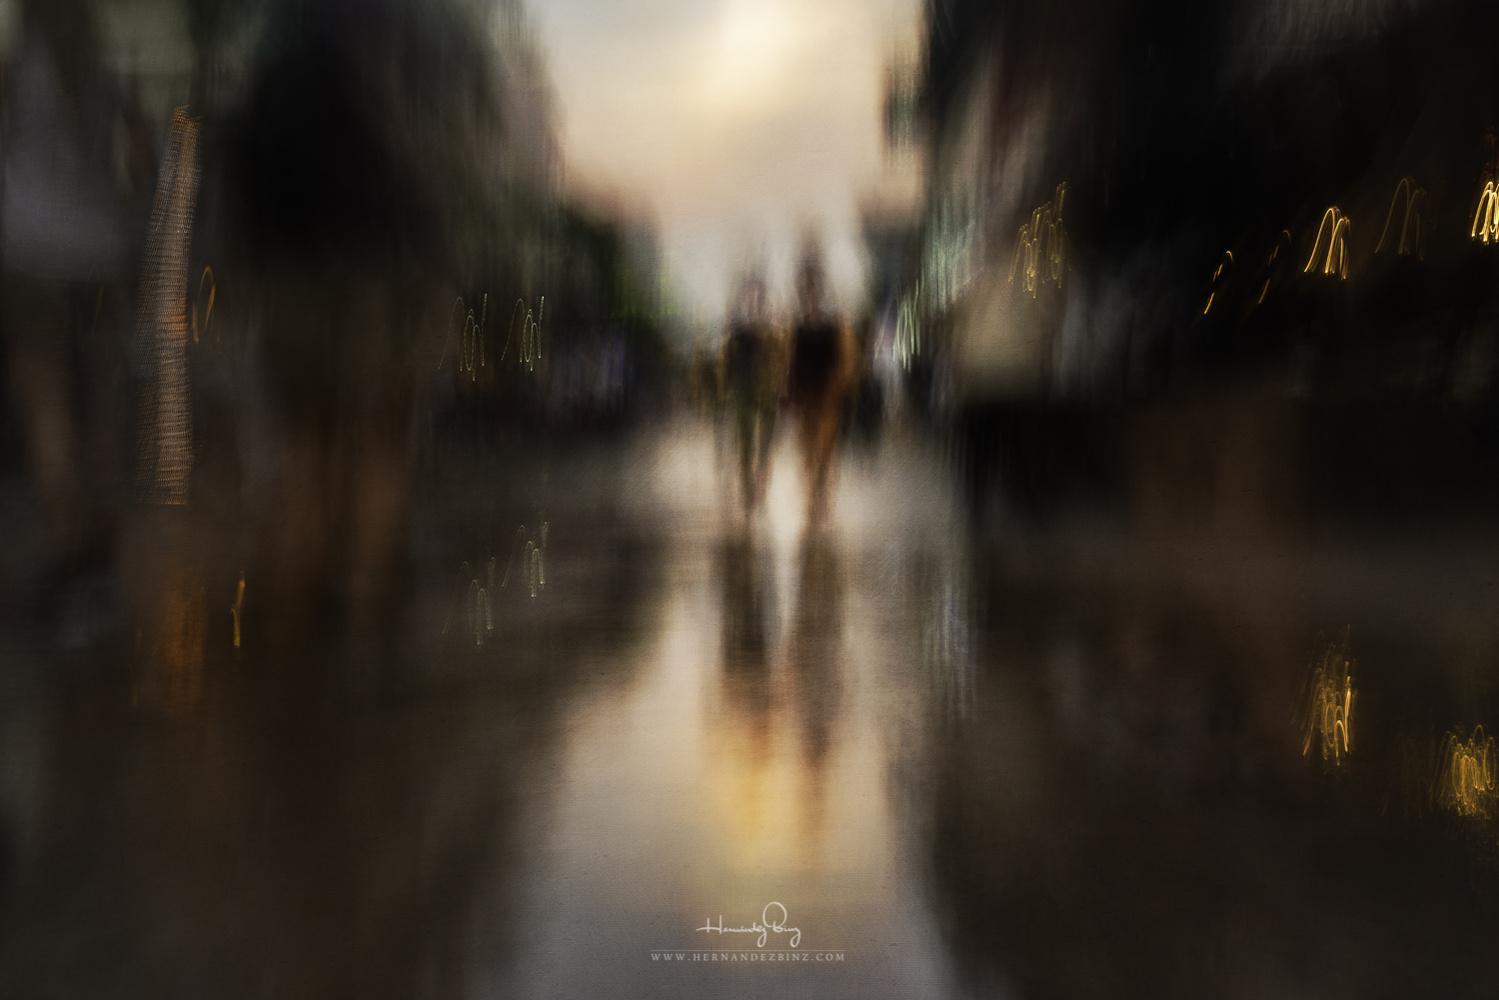 A Walk in 5th by Adrian Hernandez Binz